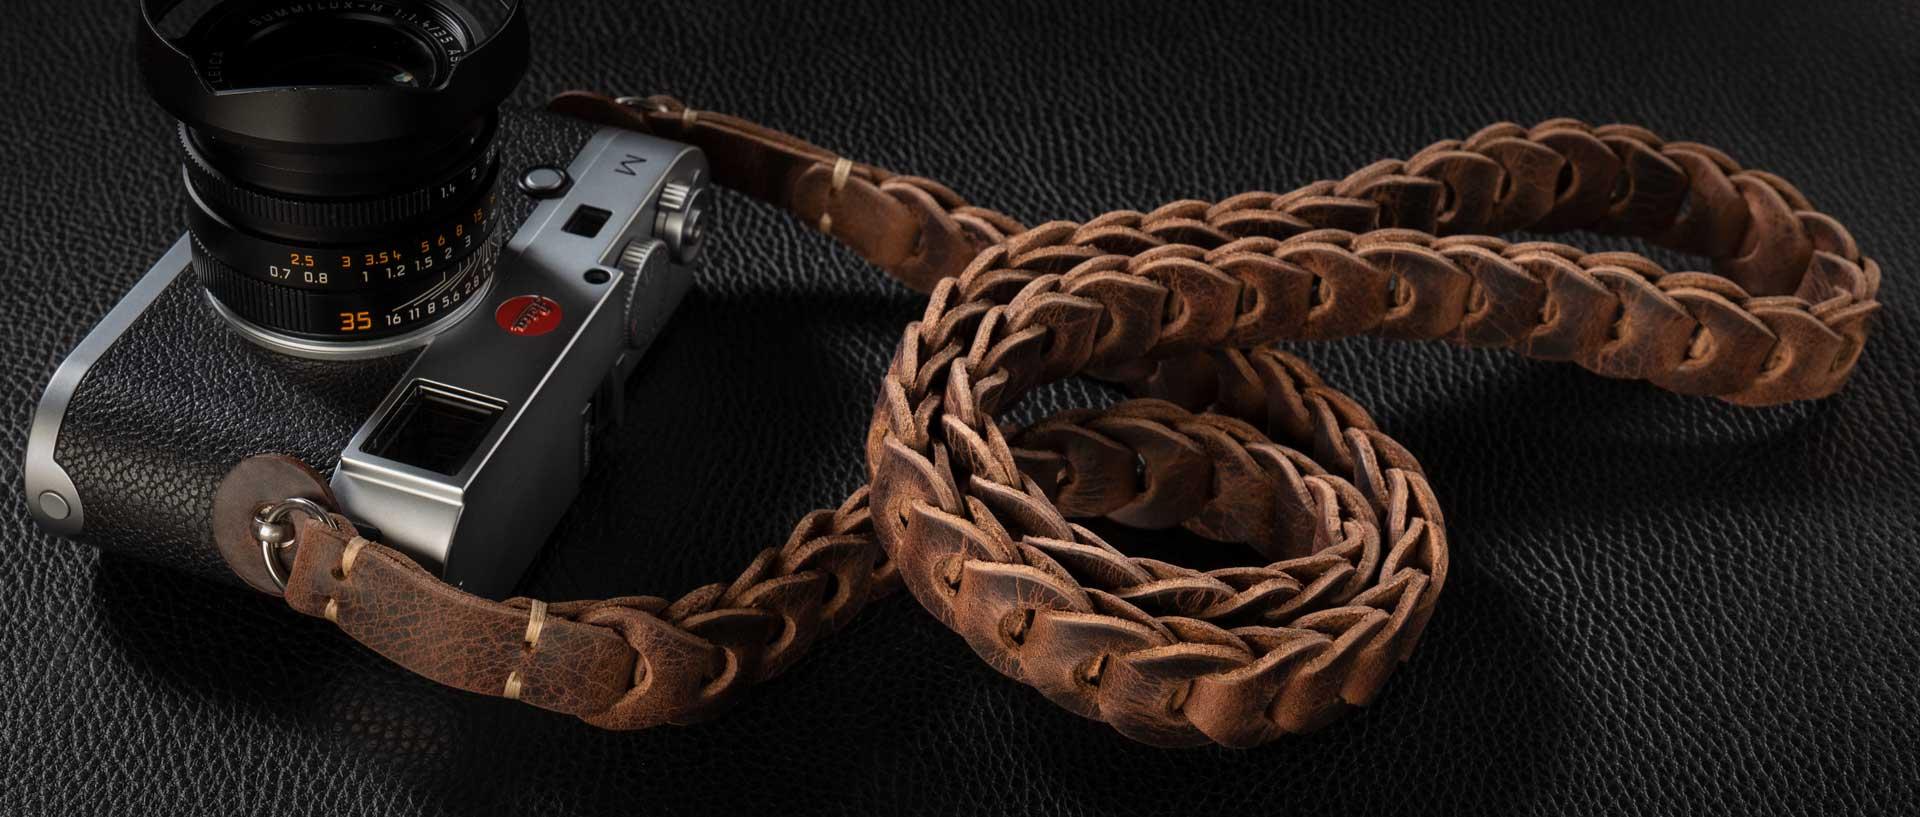 Rock n Roll M straps